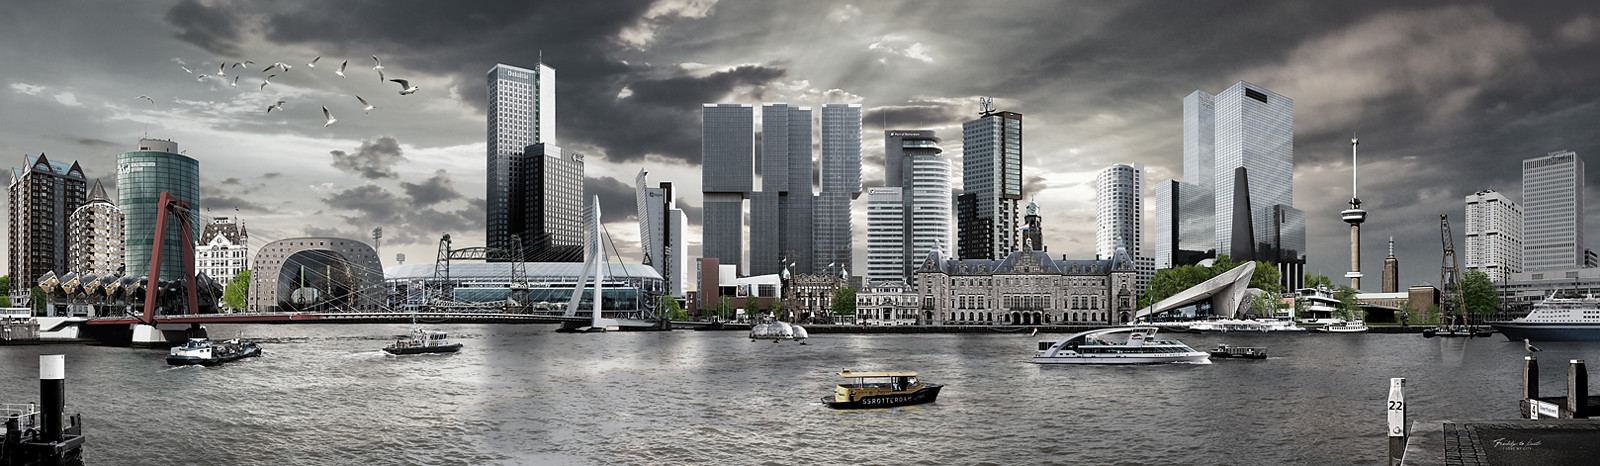 Skyline Rotterdam Urban